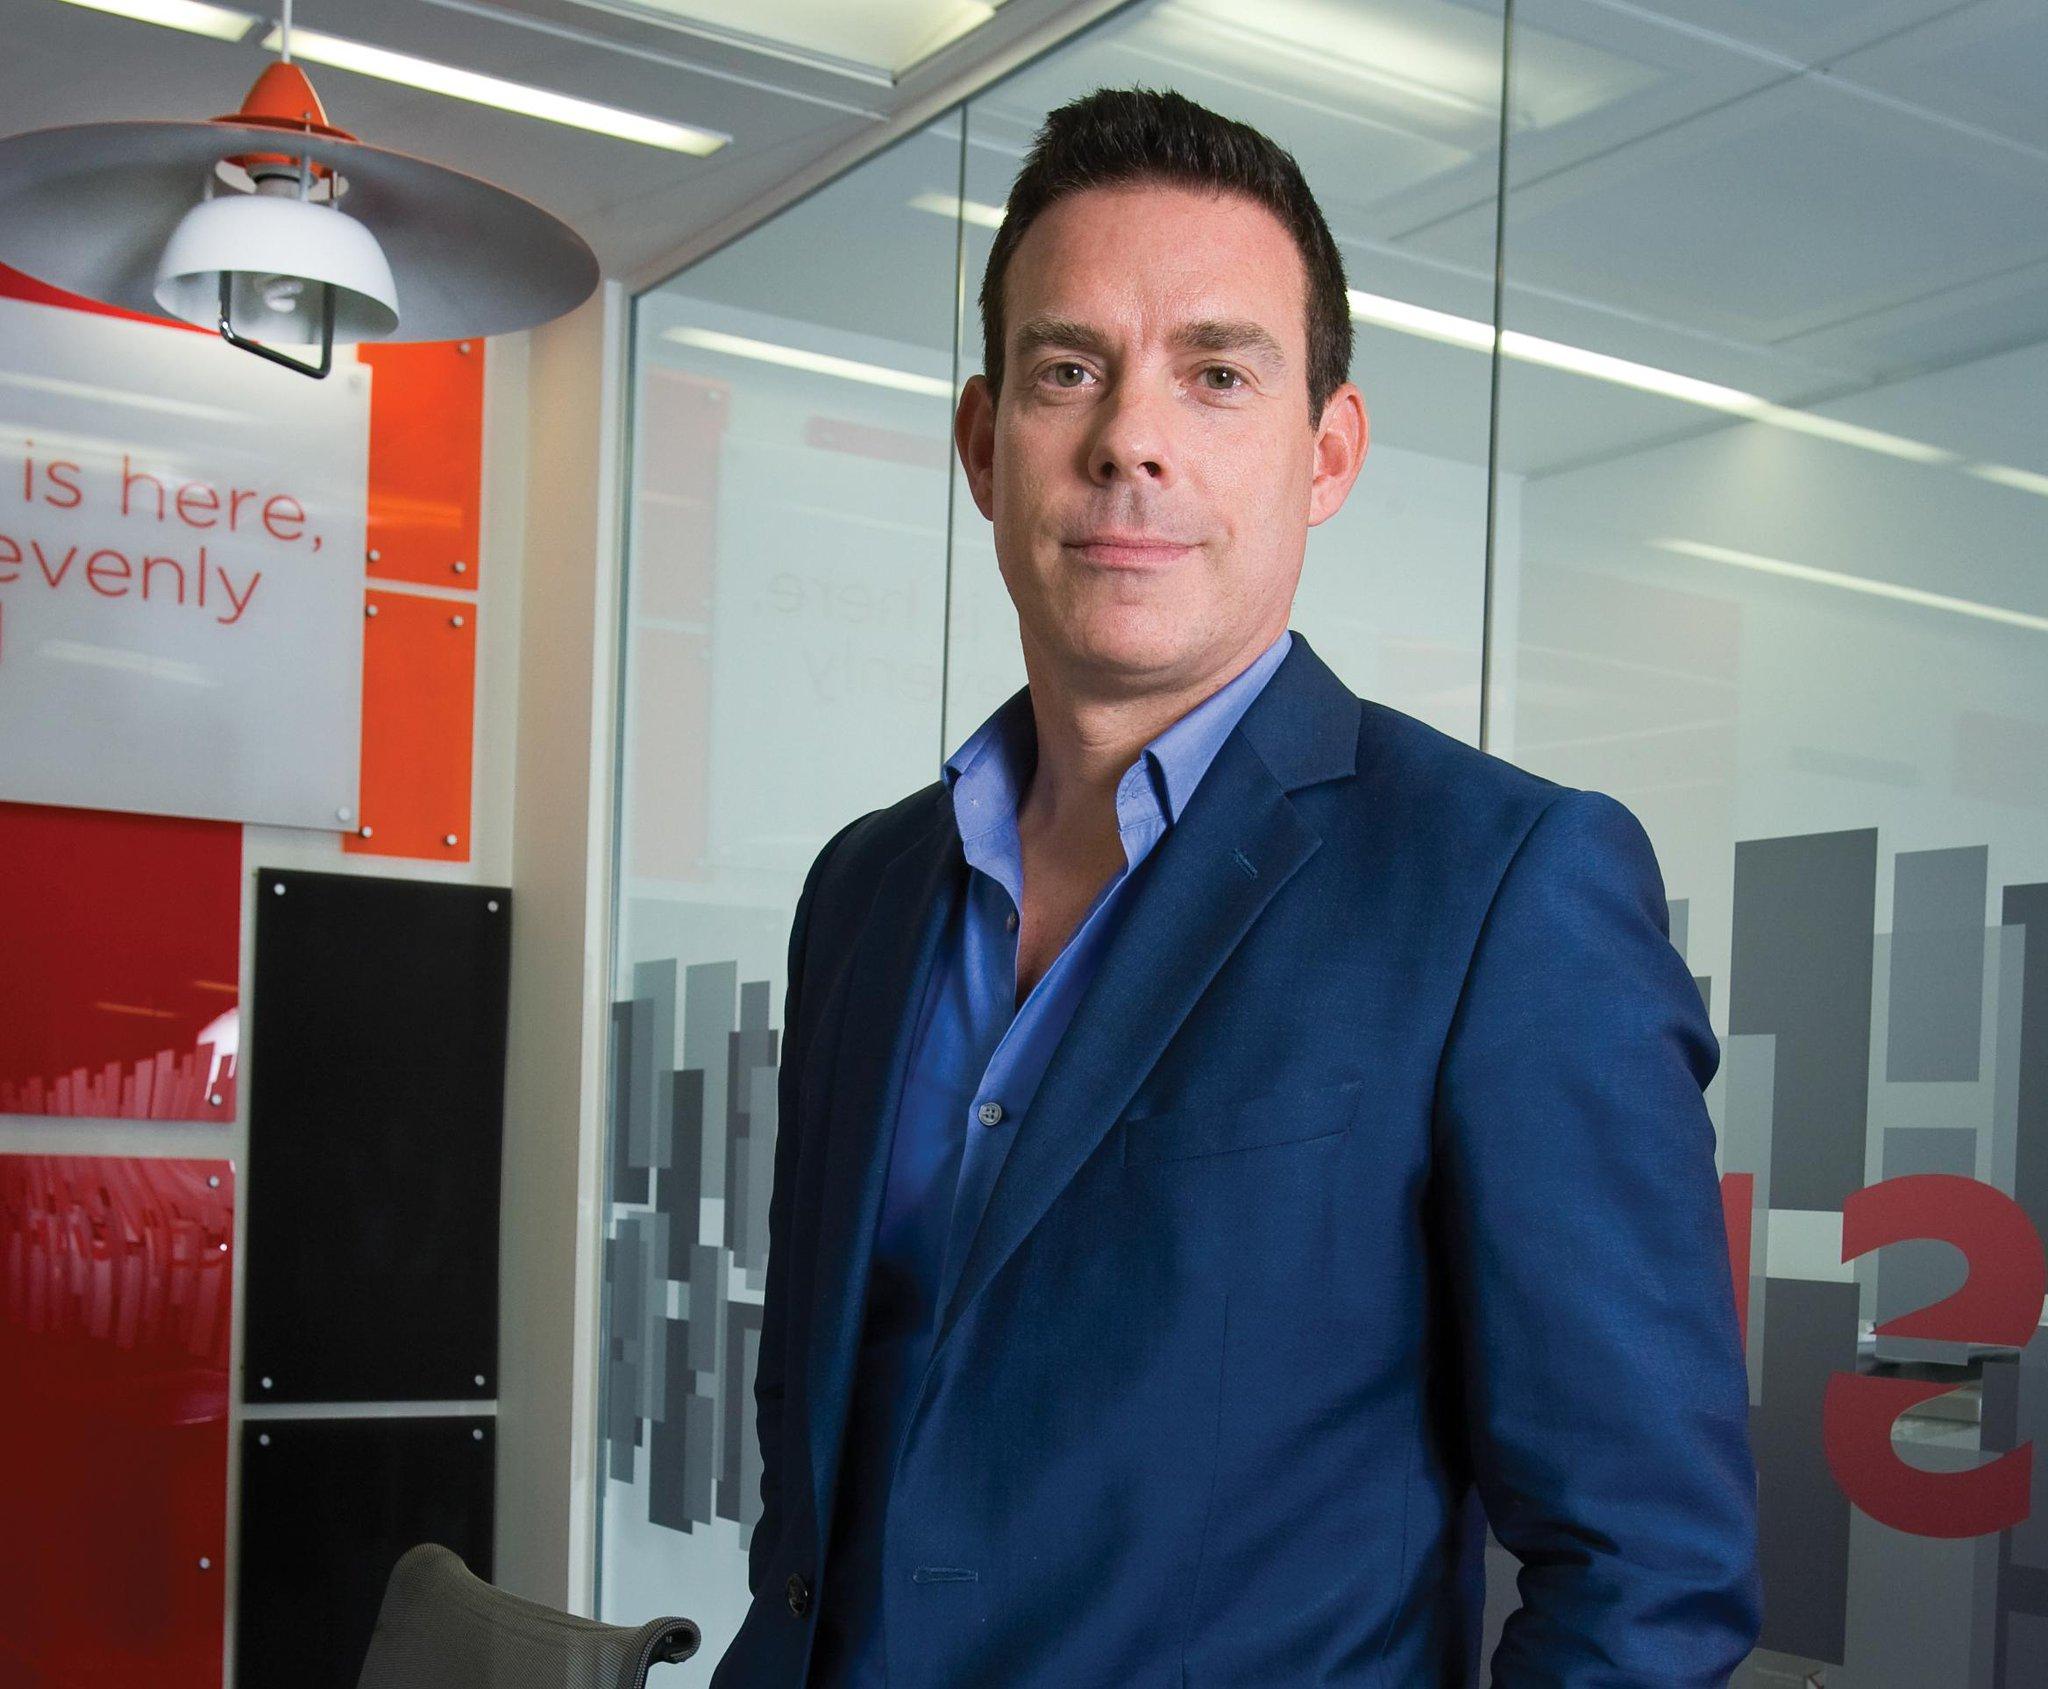 RT @HMGRecruitment: Havas Media's @Paul_Framp  on TV advertising - http://t.co/OB5bdXkEEA #Havas #insidehavas #HMG #advertising #TV #UK htt…